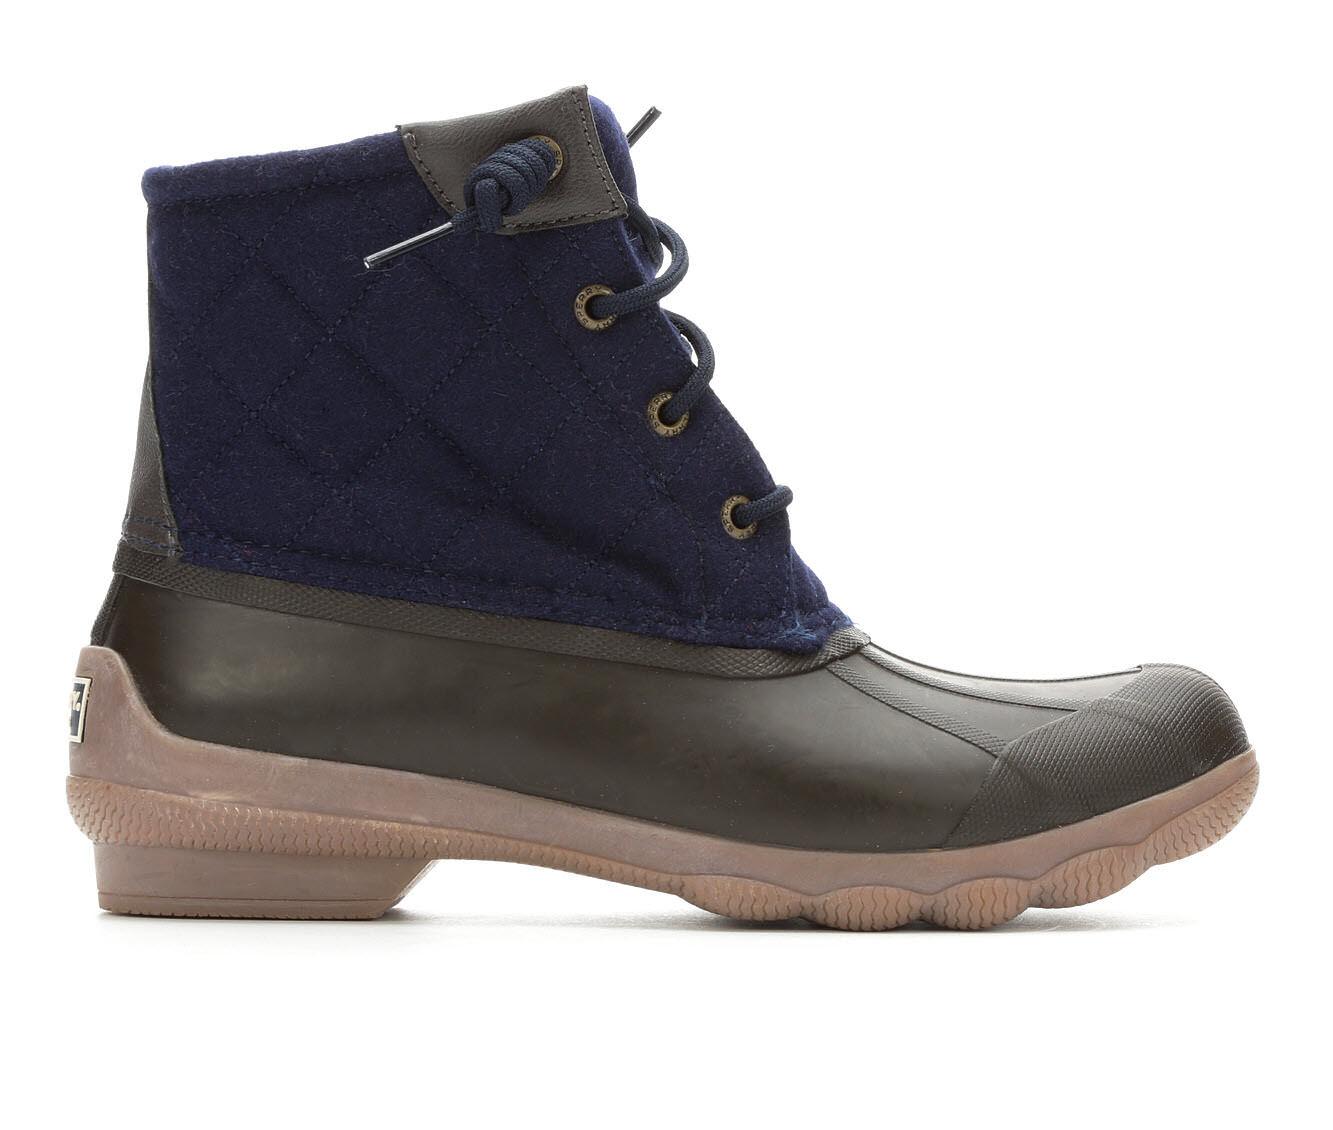 Sperry Syren Gulf Wool Duck Boots